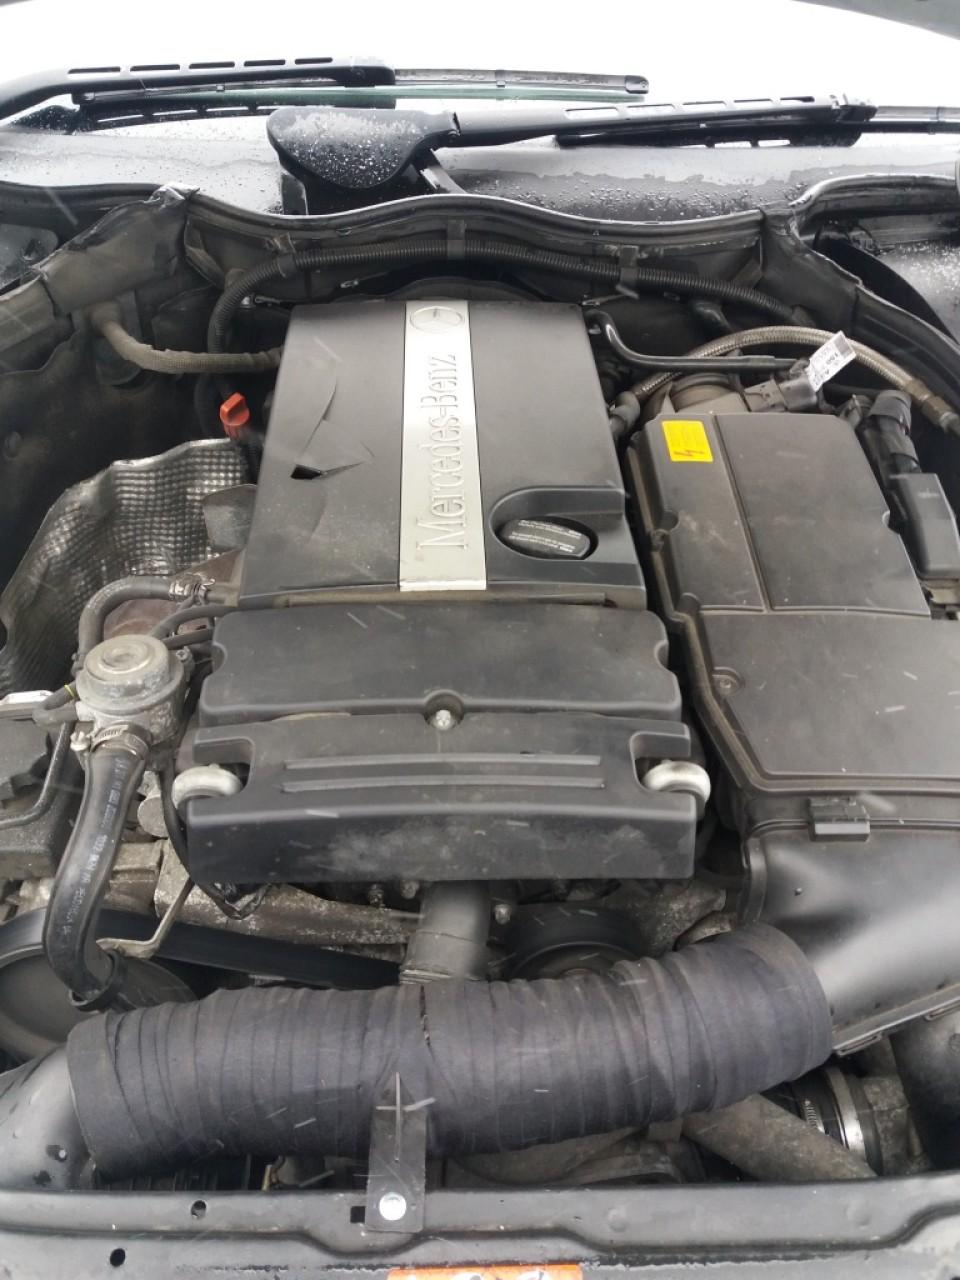 Galerie evacuare Mercedes C-CLASS Coupe Sport CL203 2005 coupe 1.8 kompressor